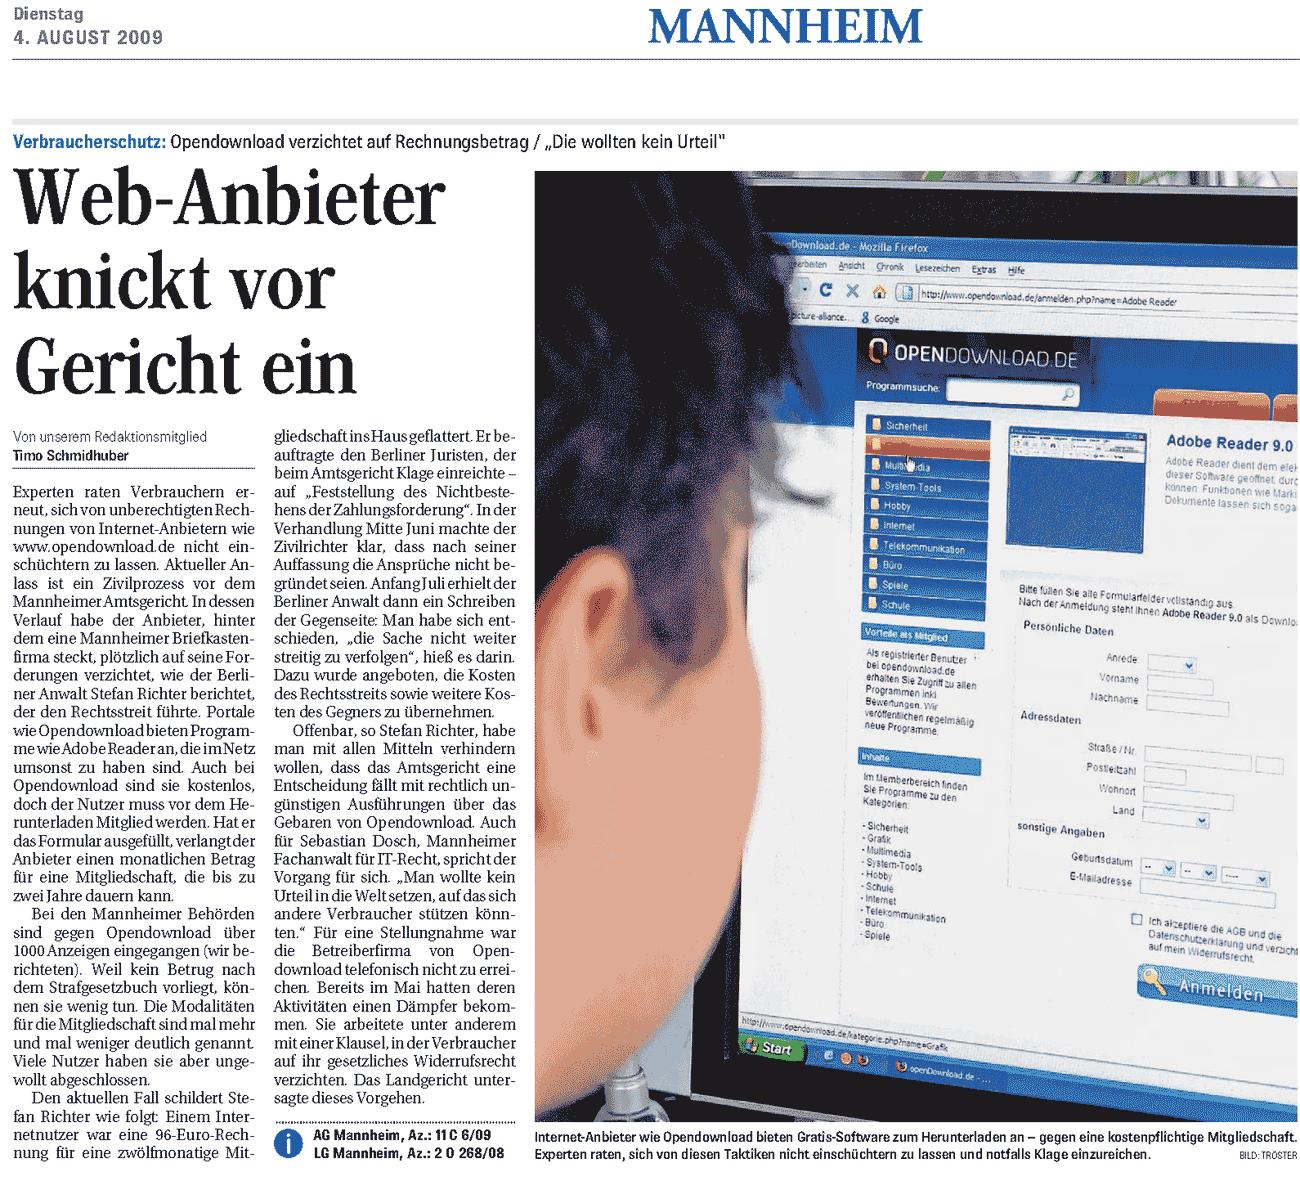 Mannheimer Morgen: Web-Anbieter knickt vor Gericht ein (Rechteinhaber: Mannheimer Morgen/Schmidhuber/Tröster)